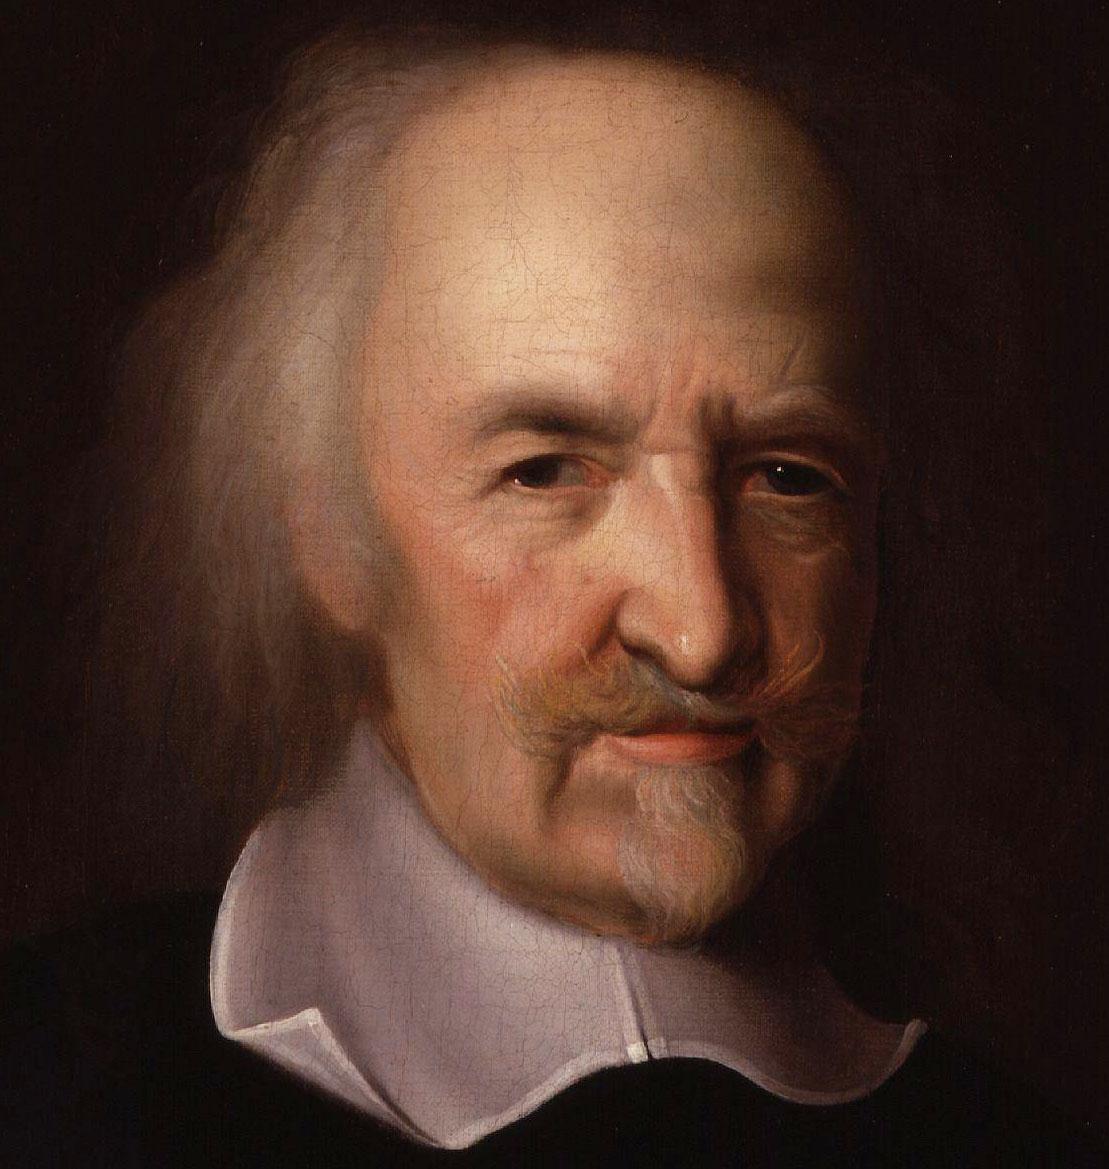 Thomas Hobbes (portrait, 17th C)